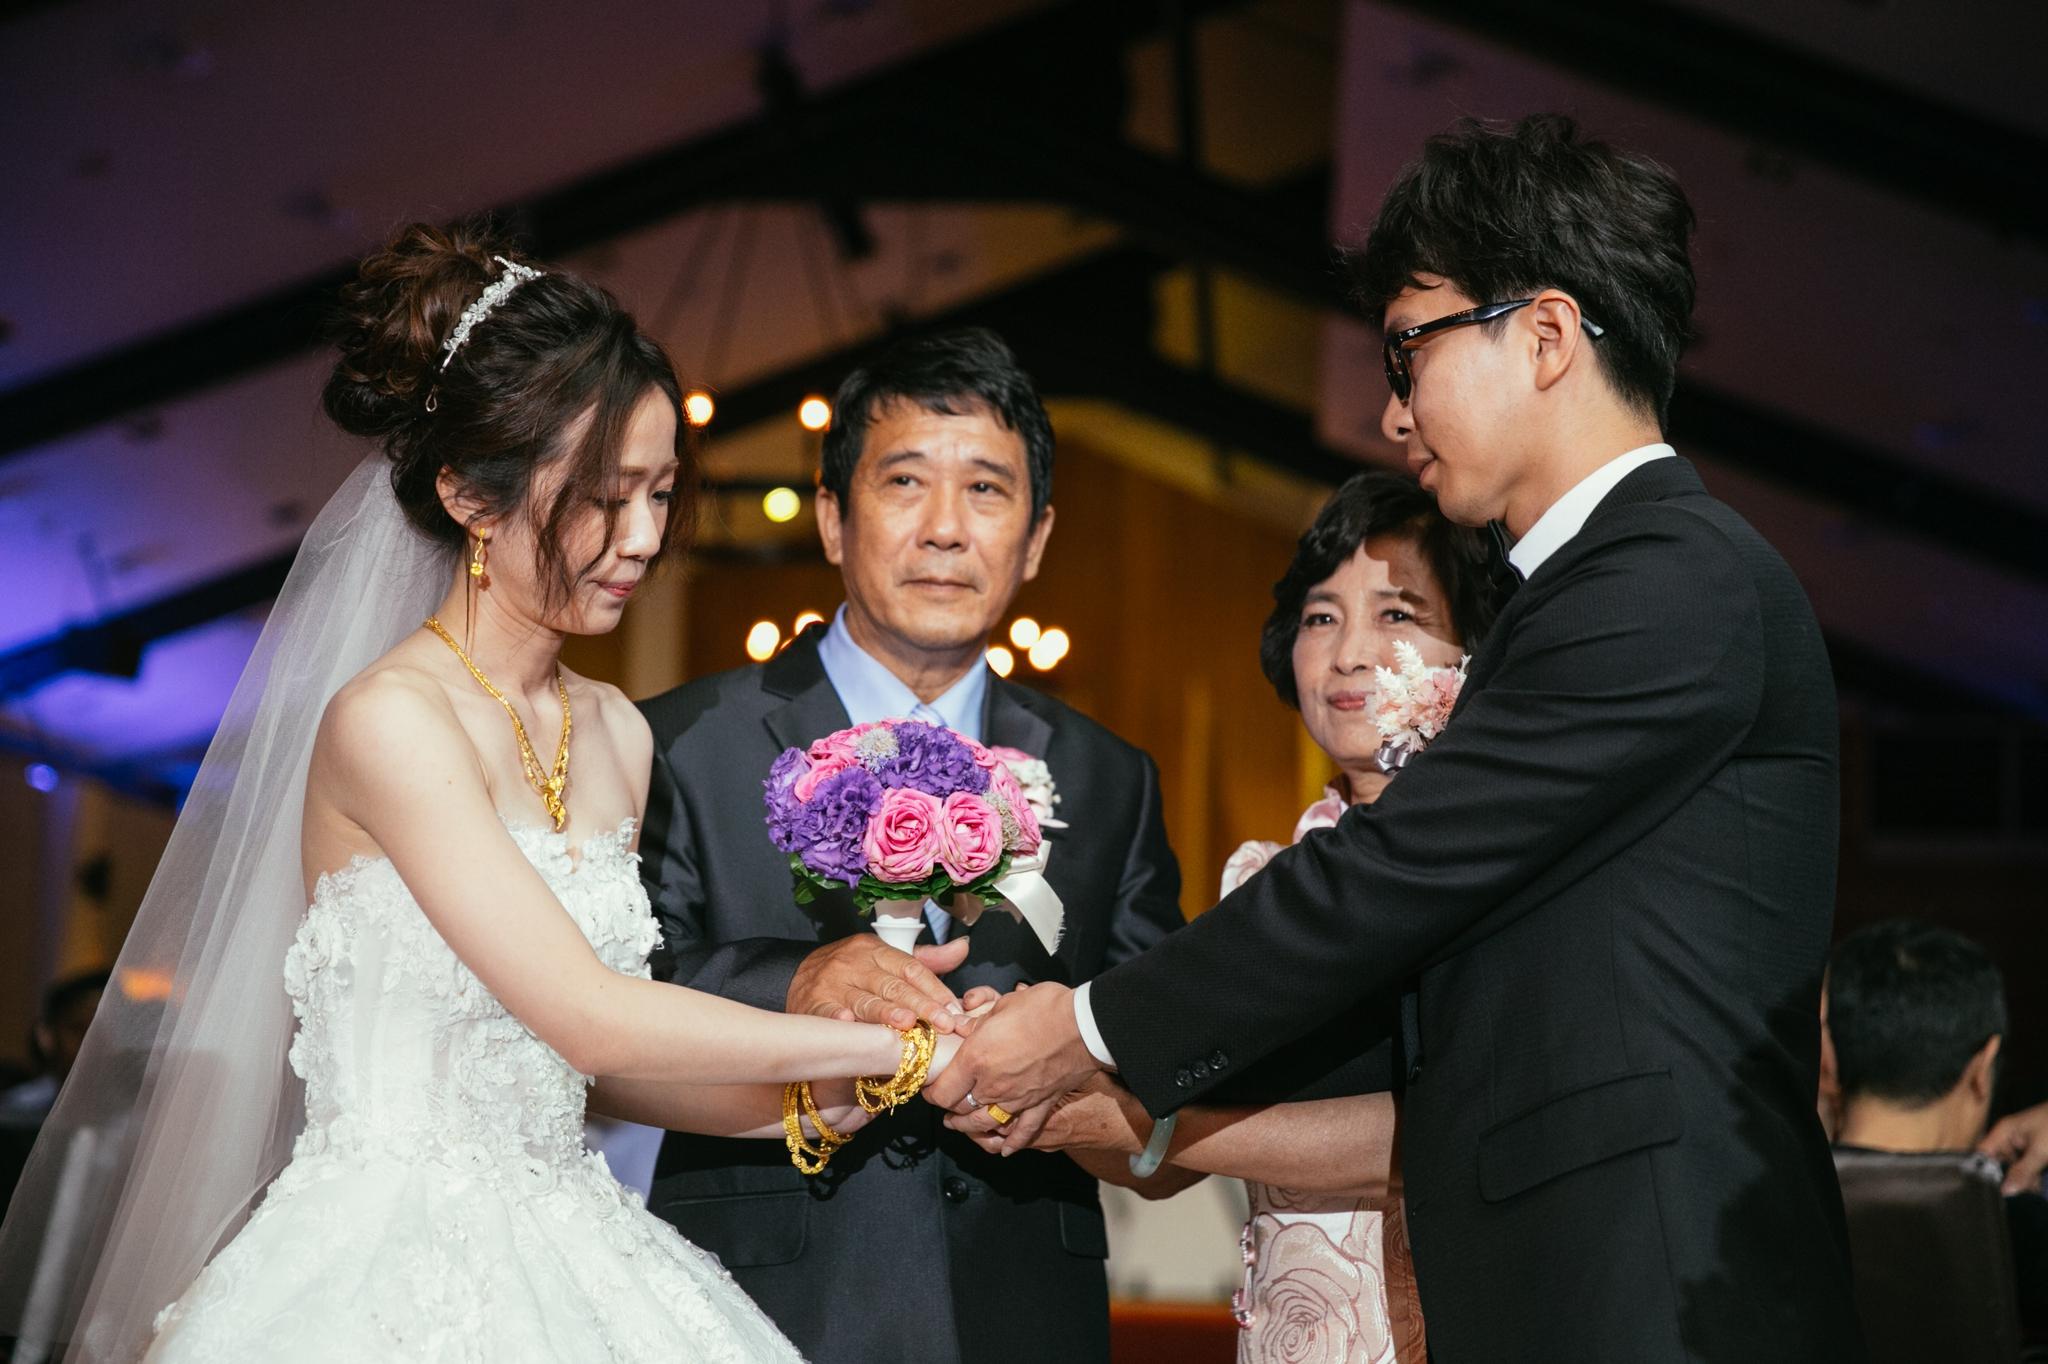 Tina+Nash-wedding-台北婚禮迎娶晚宴-新莊終身大事-126.jpg